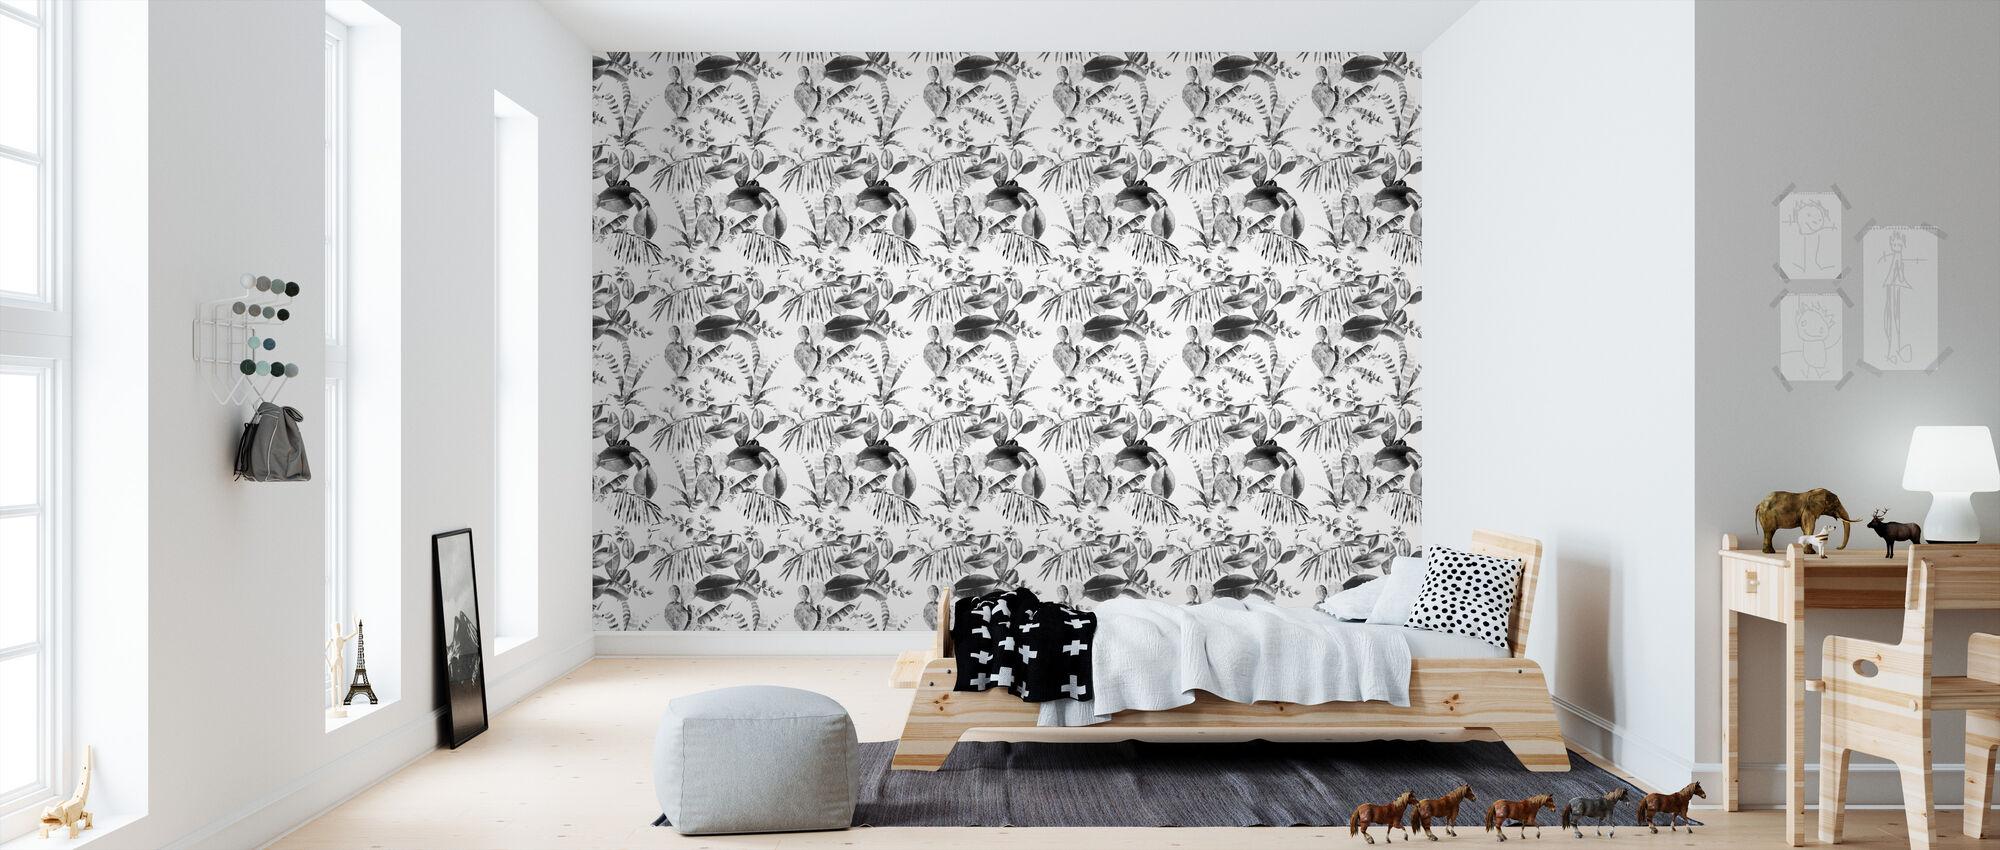 Cactus bw - Wallpaper - Kids Room